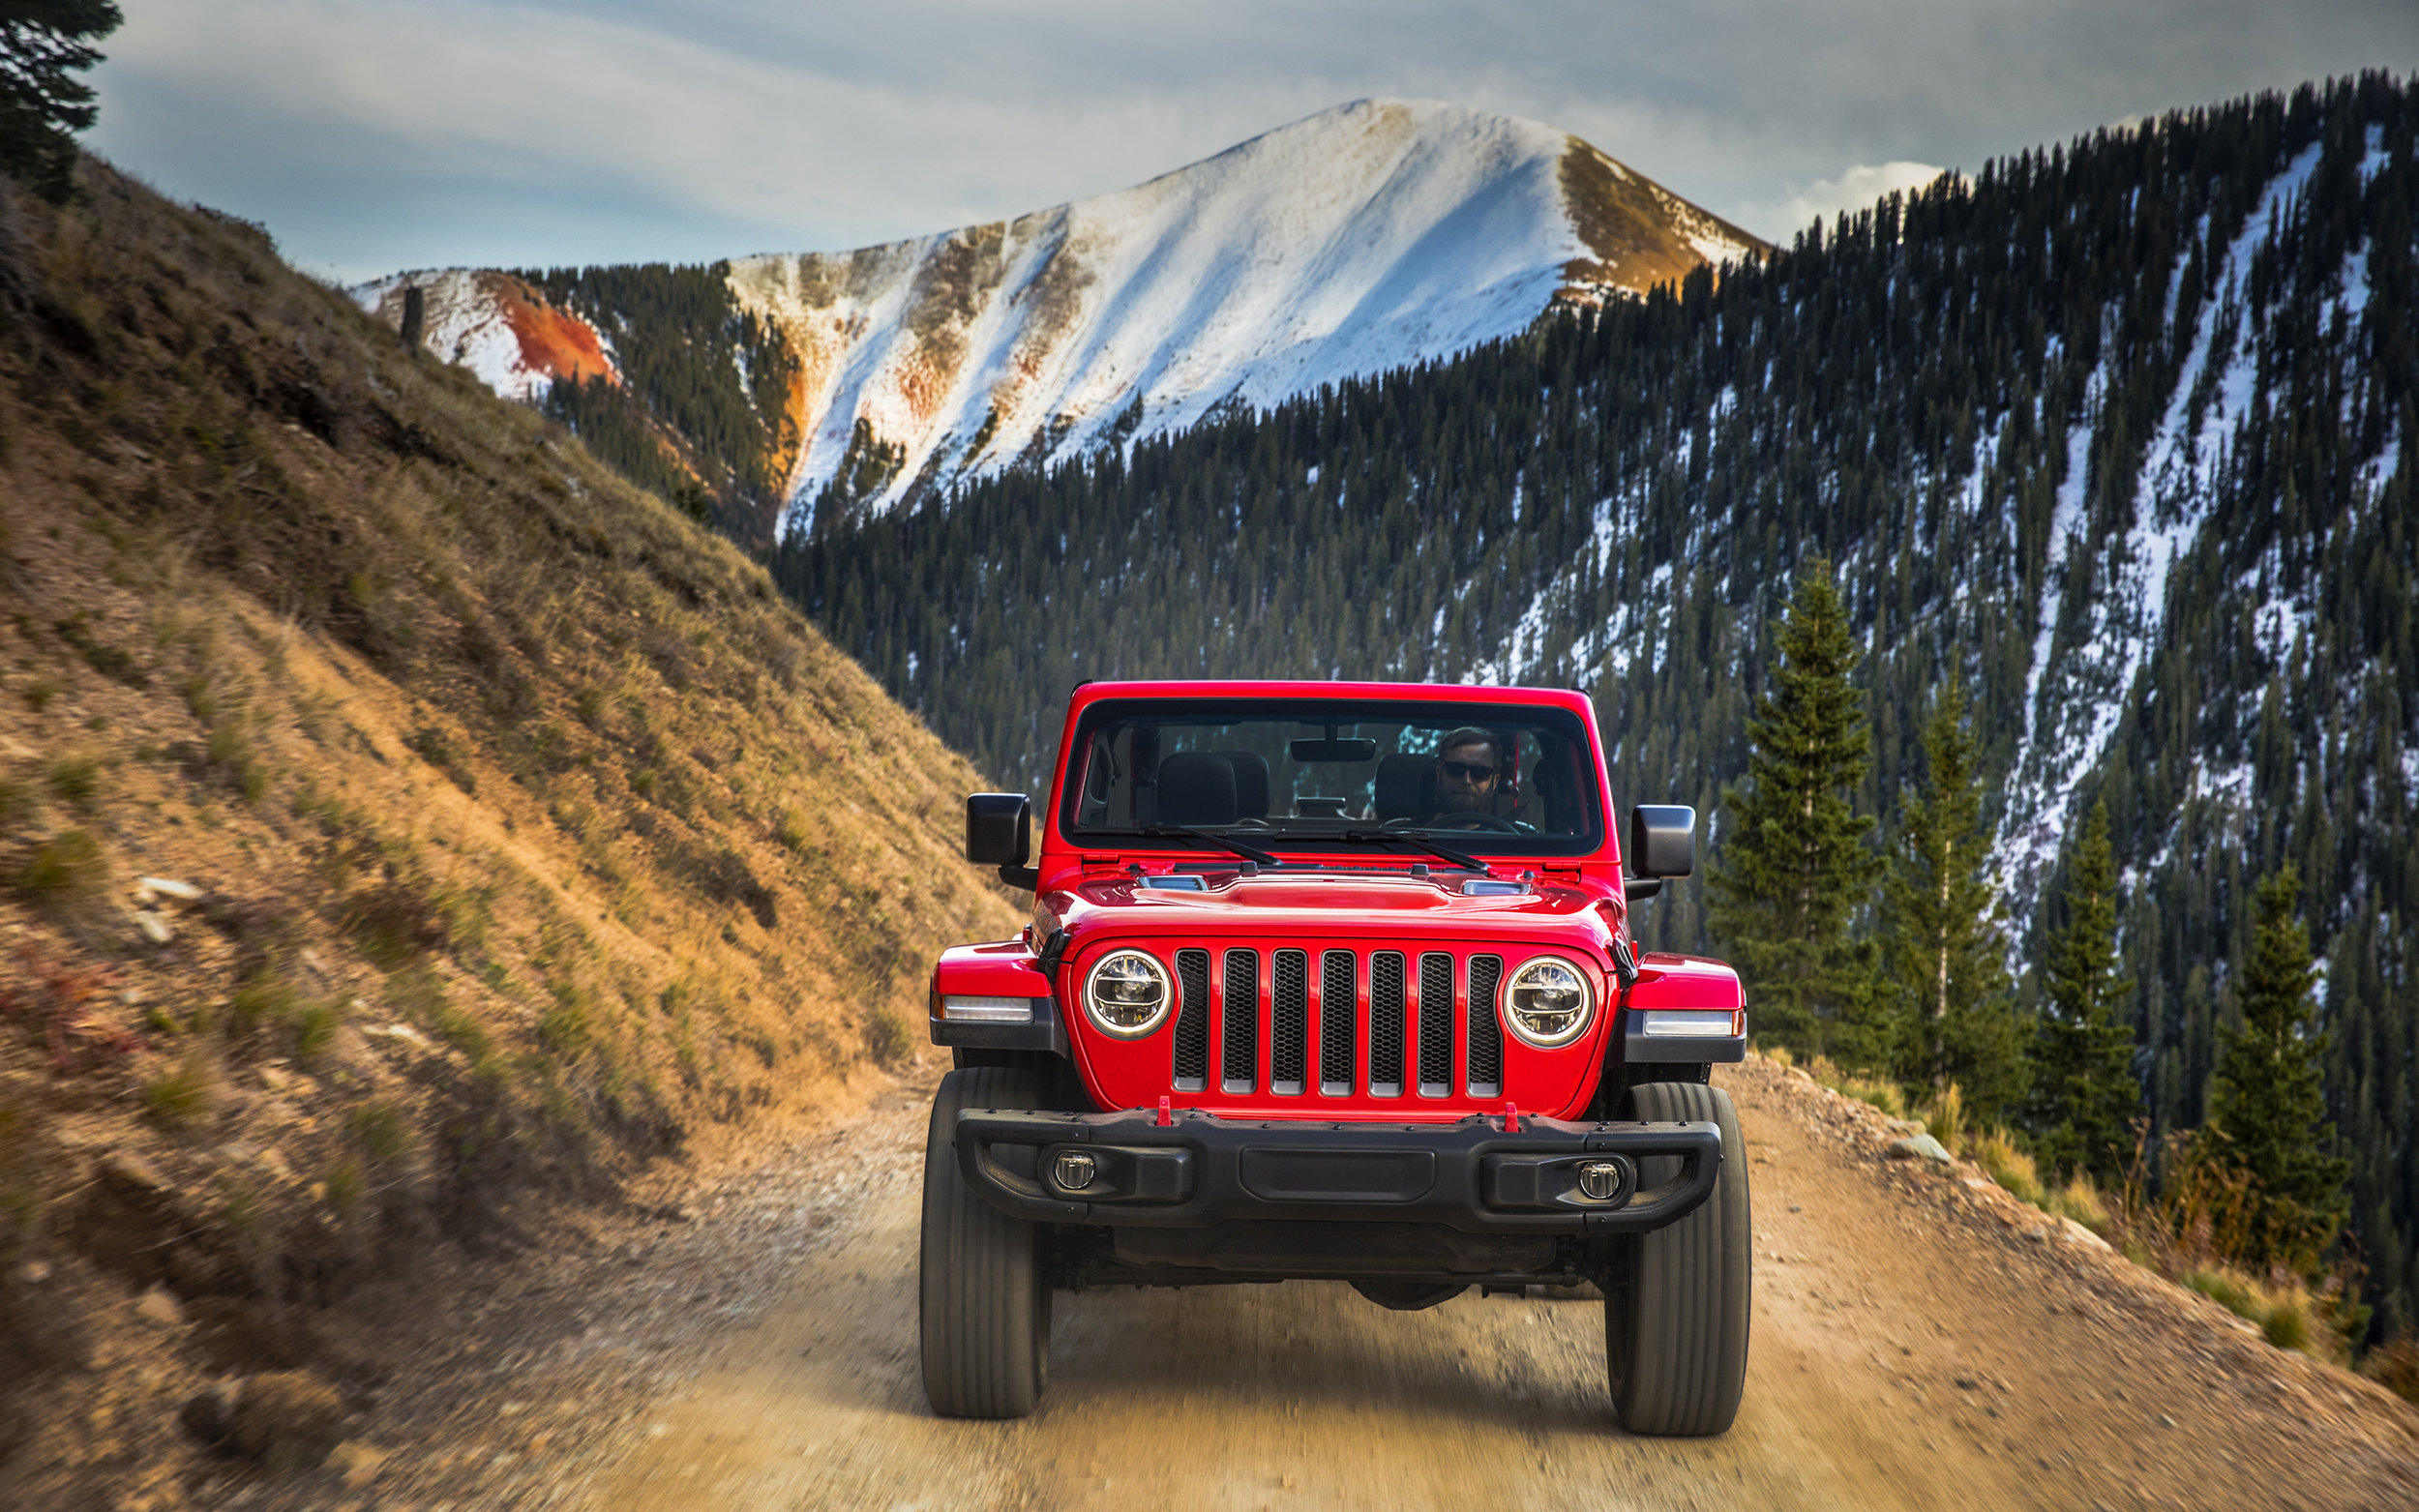 jeep-wrangler-rubicon-2018-red-suv-american-cars-mountain-road.jpg